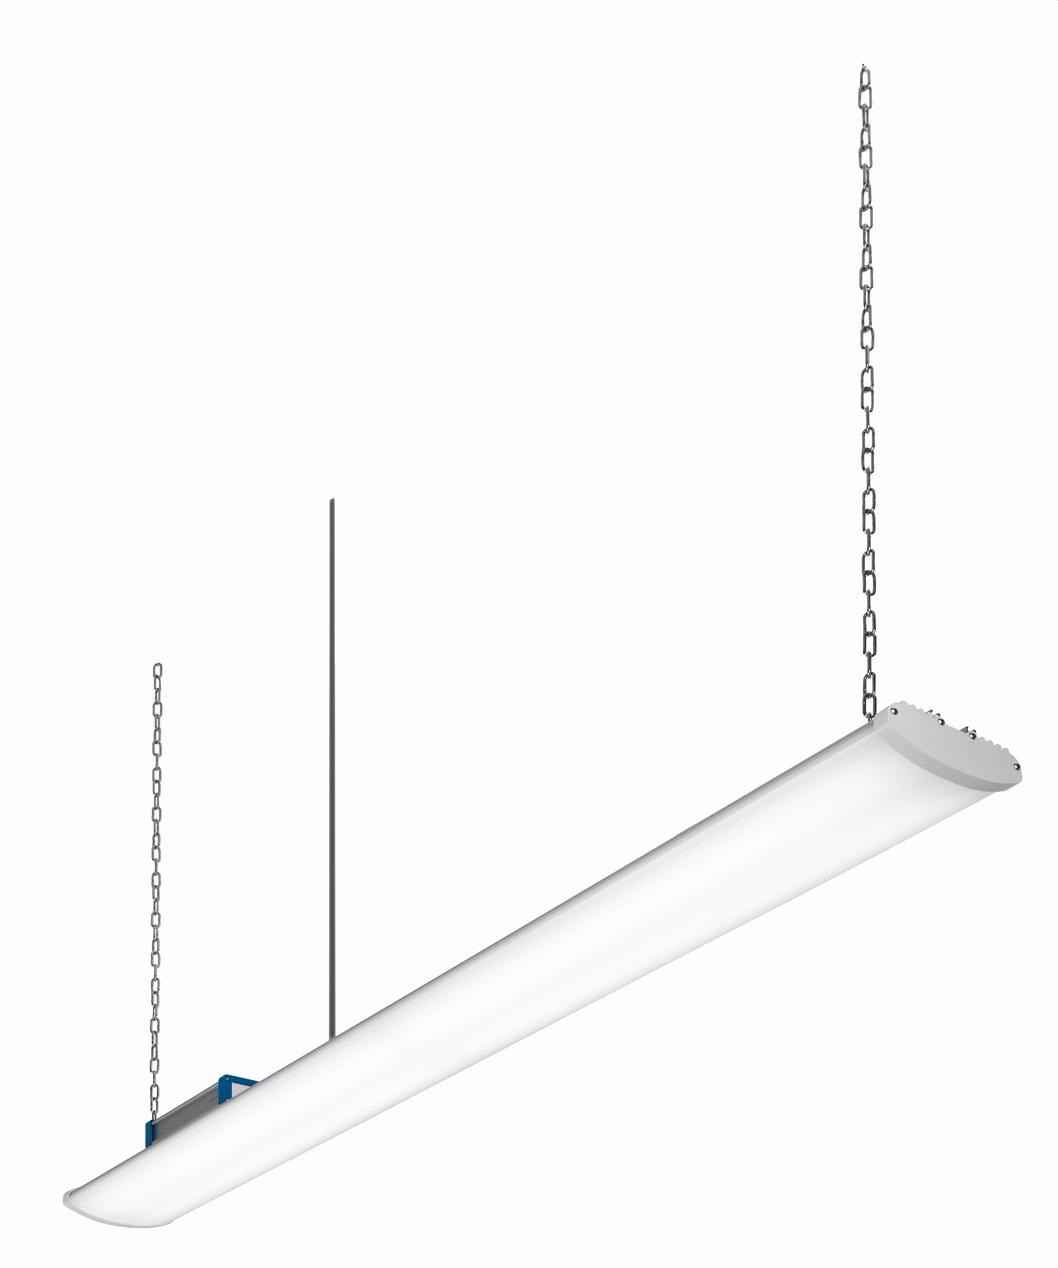 LED Langfeld Hallenstrahler - 200 W